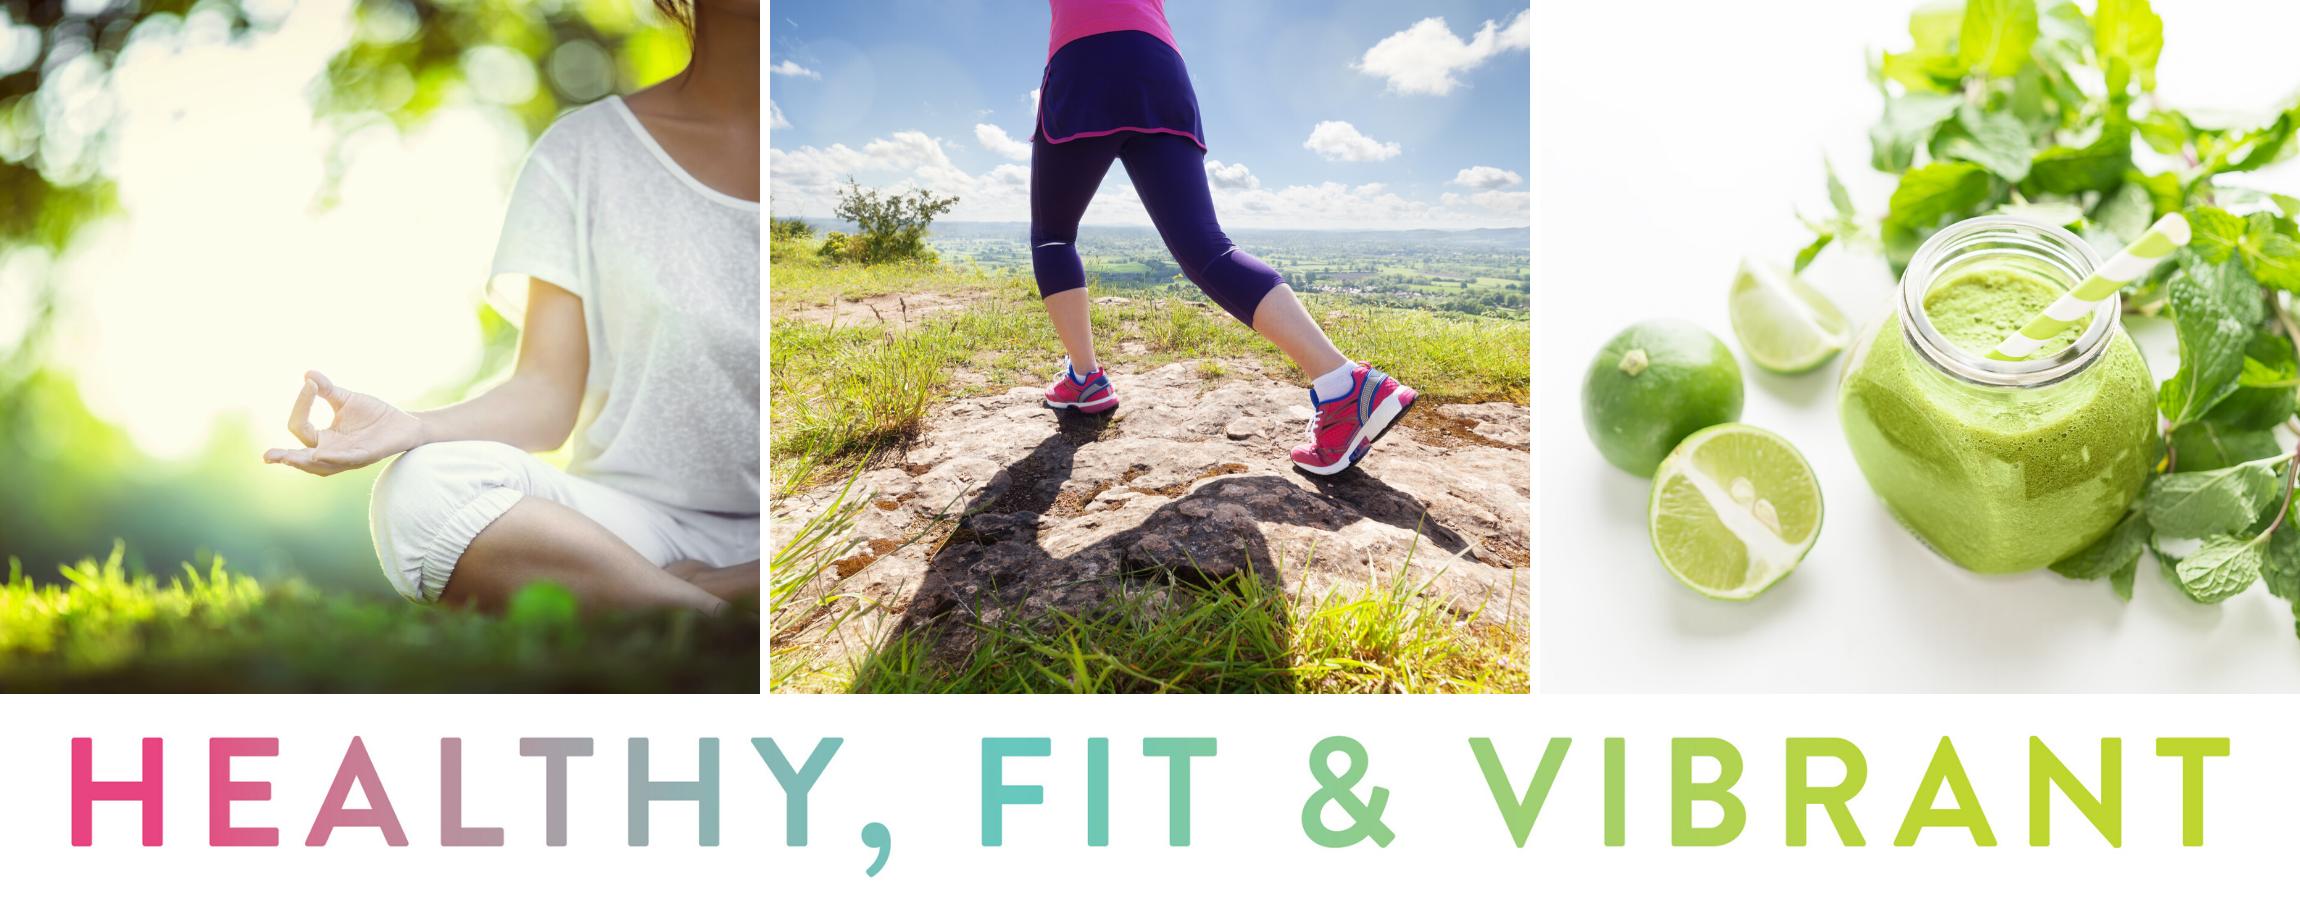 Vegan, Health and Fitness Image